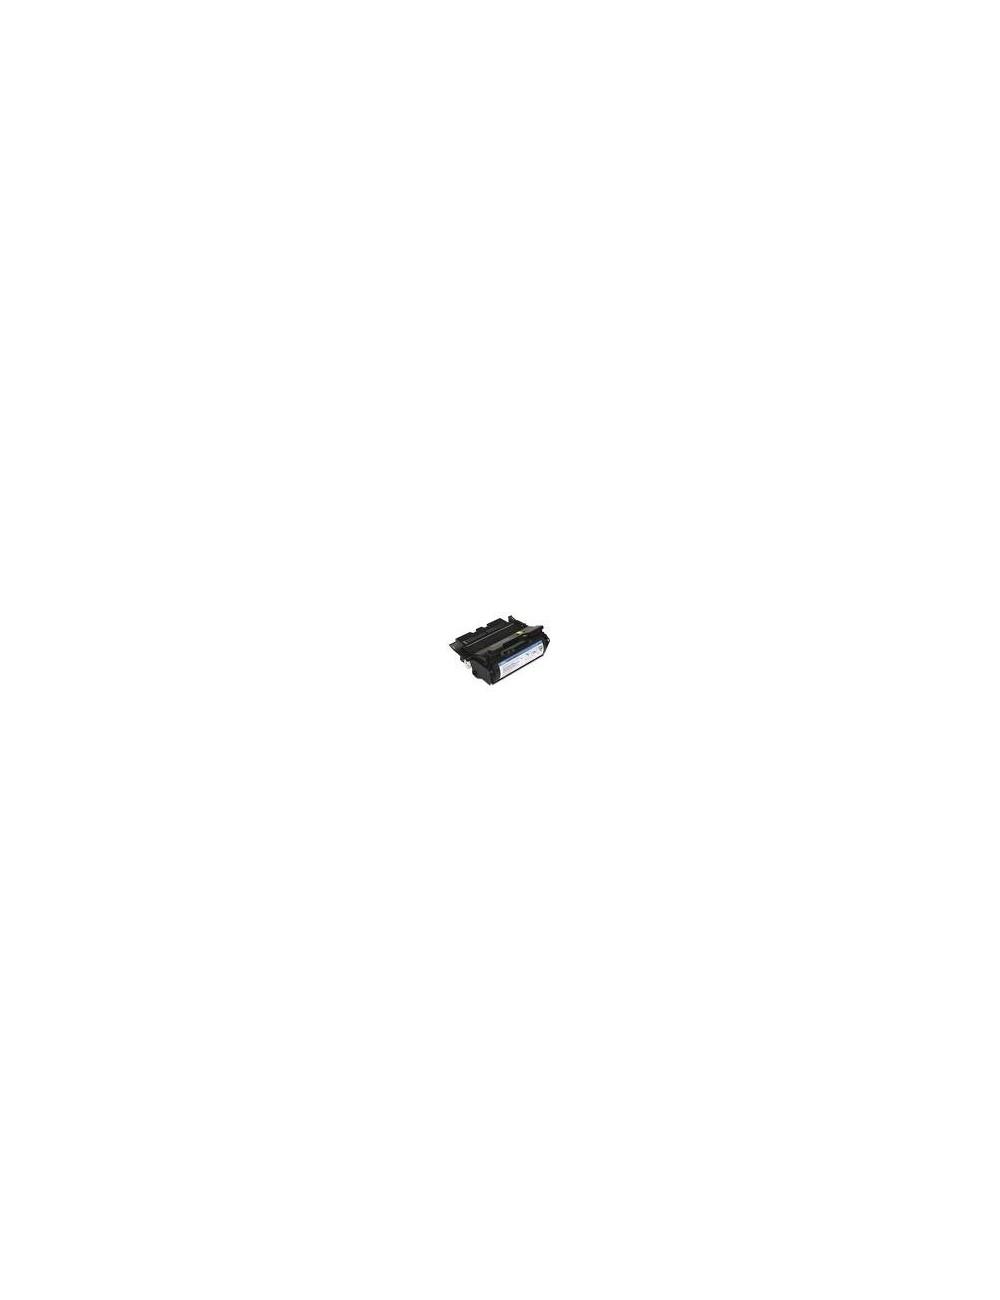 IBM 1601/1602/1612/1622 Μονάδα Τυμπάνου